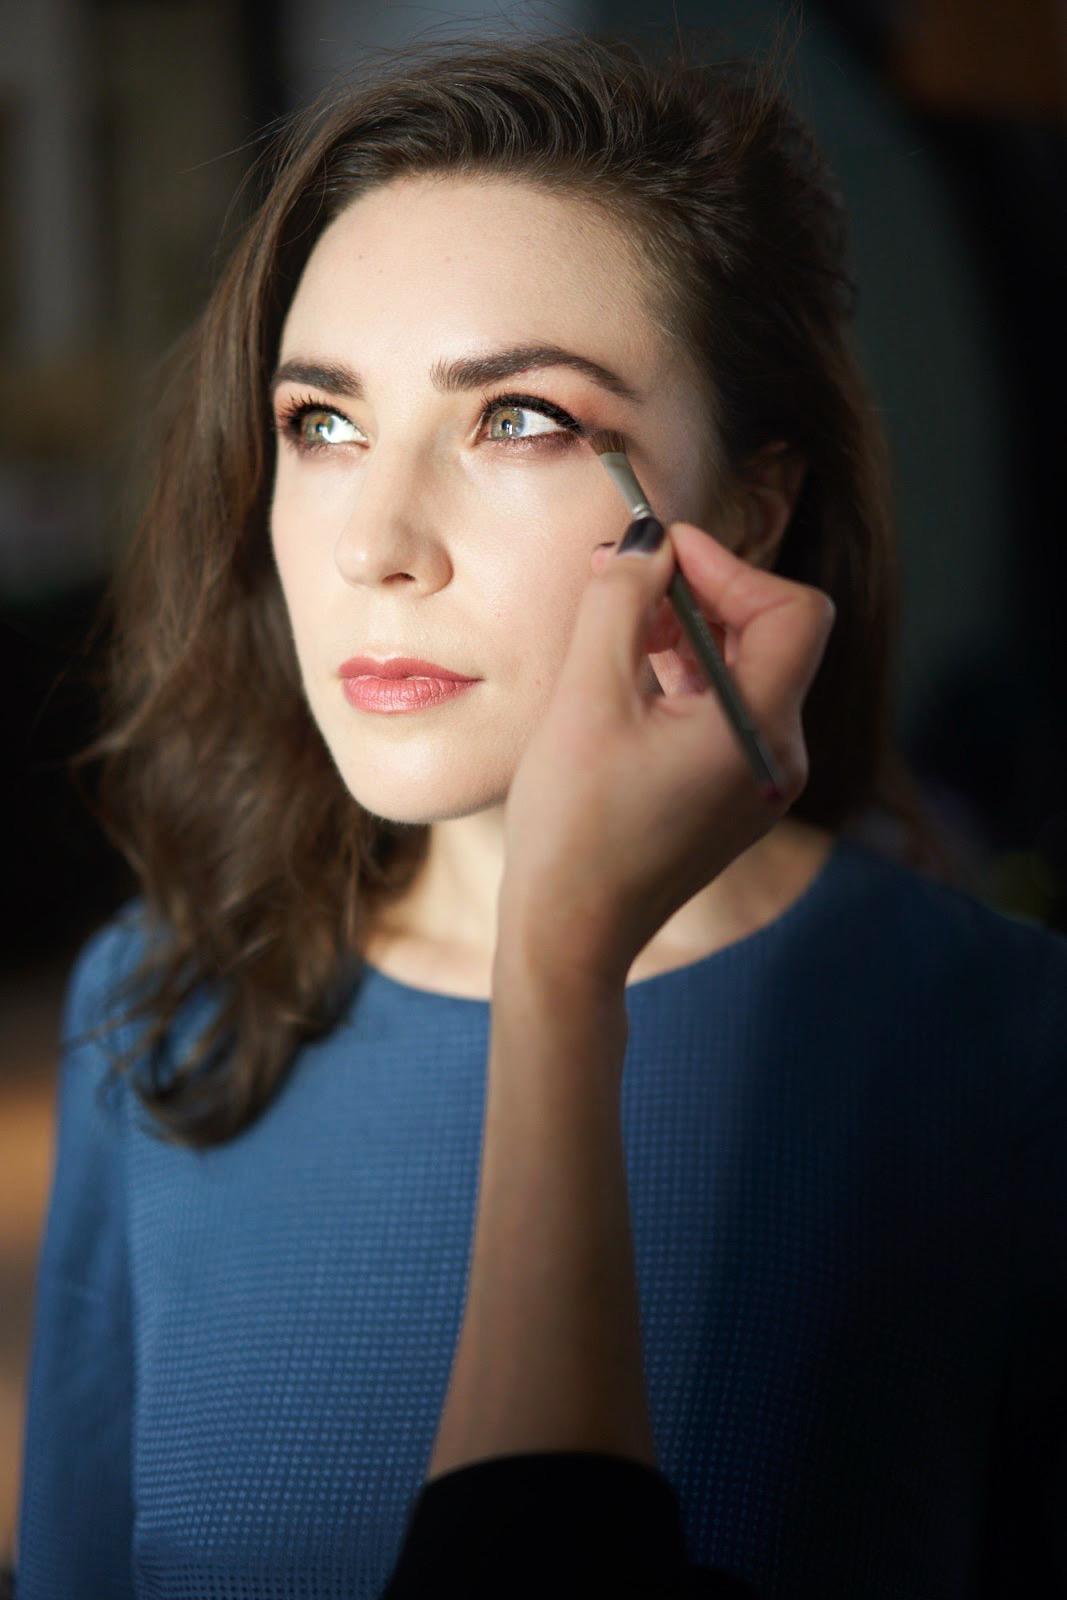 Charlotte Tilbury Maquillage Test Avis